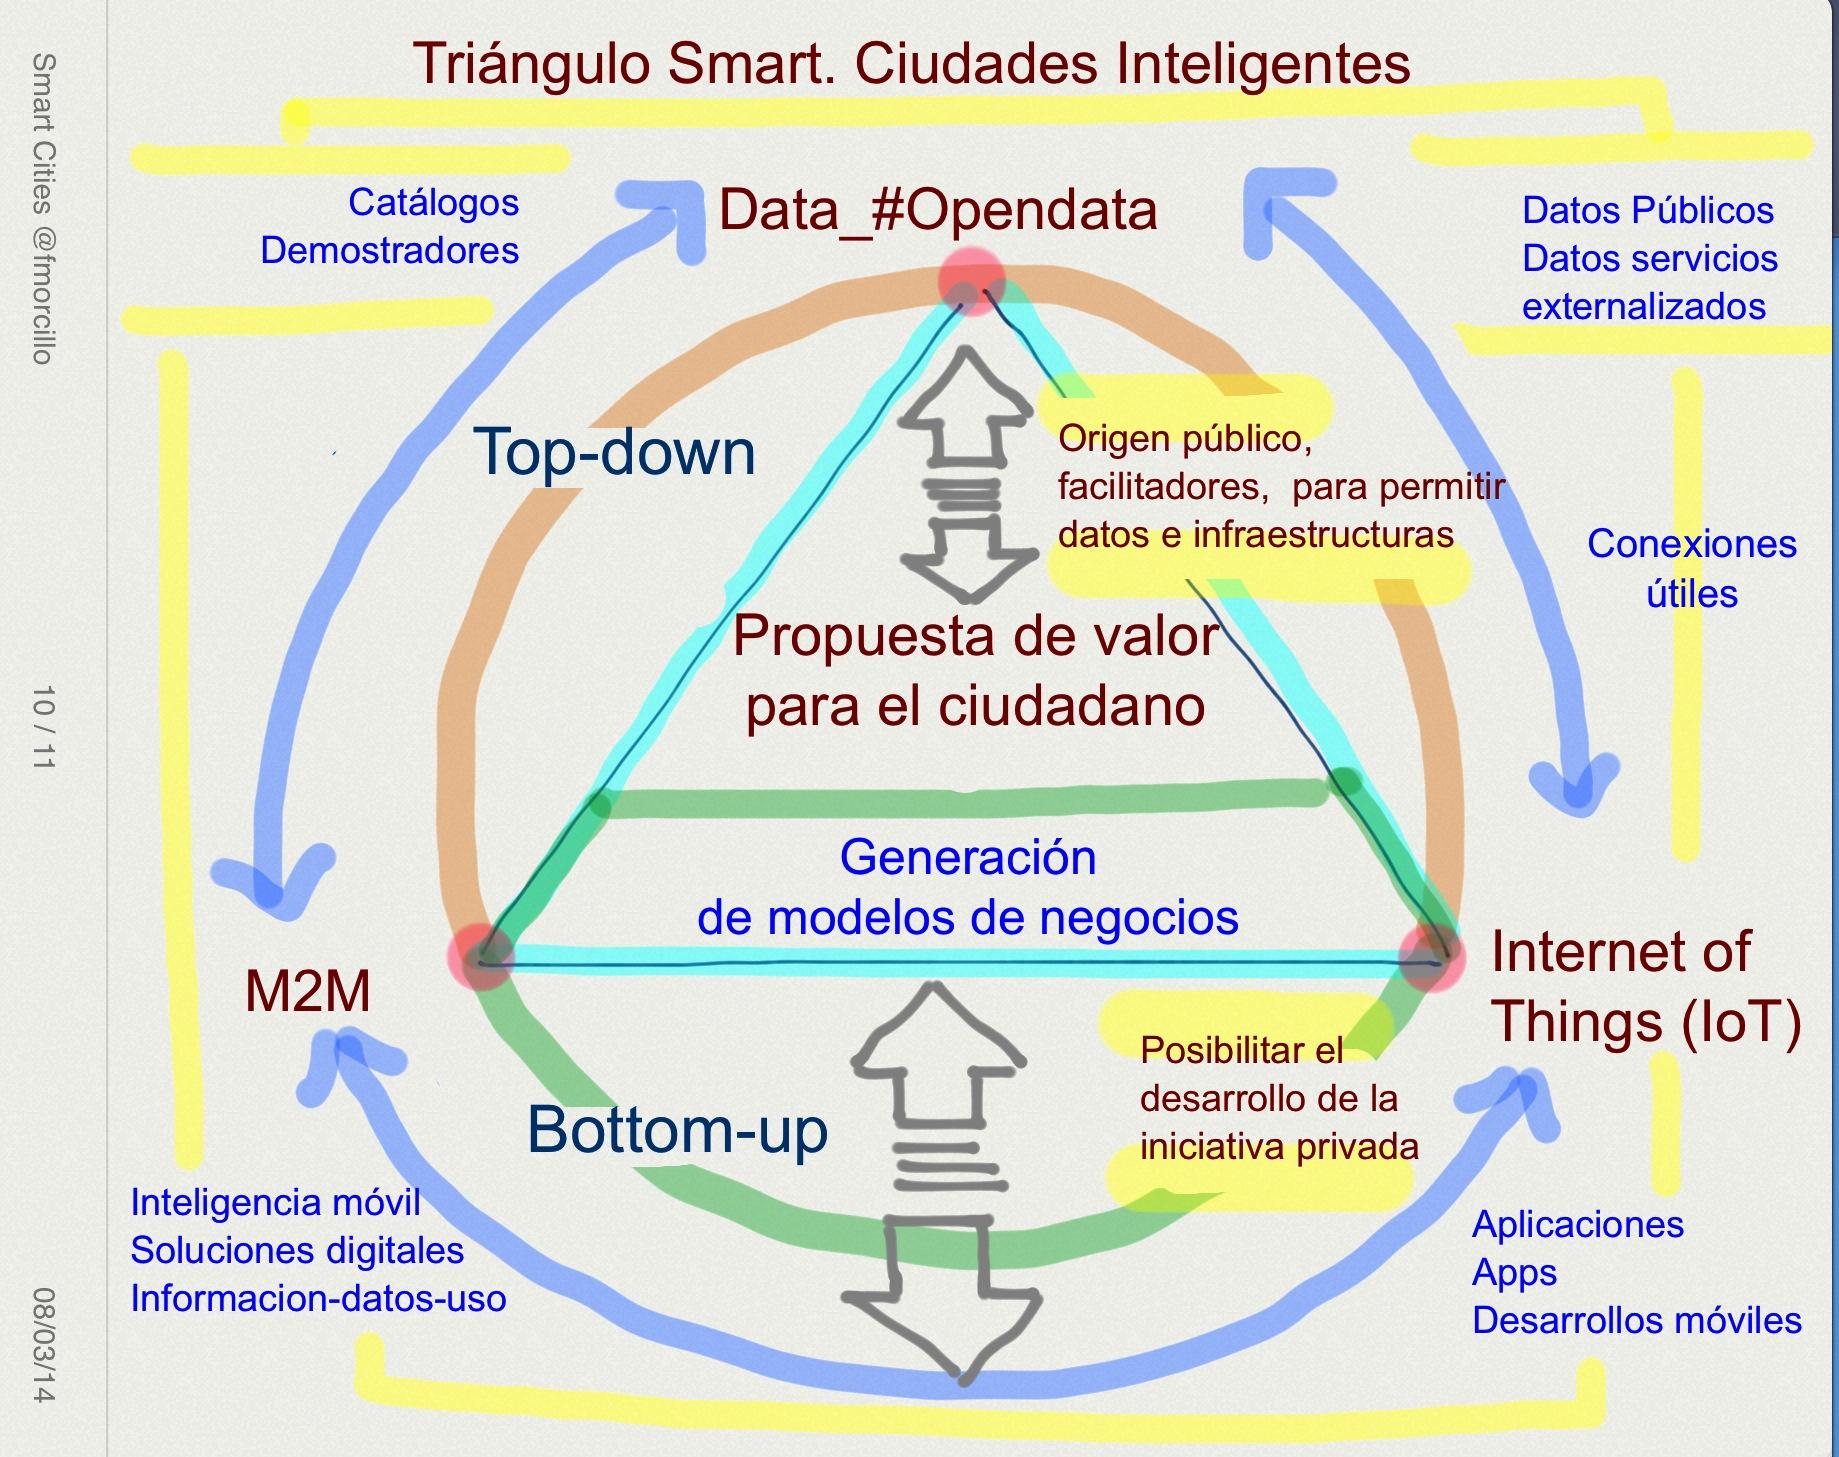 Triangulo Smart